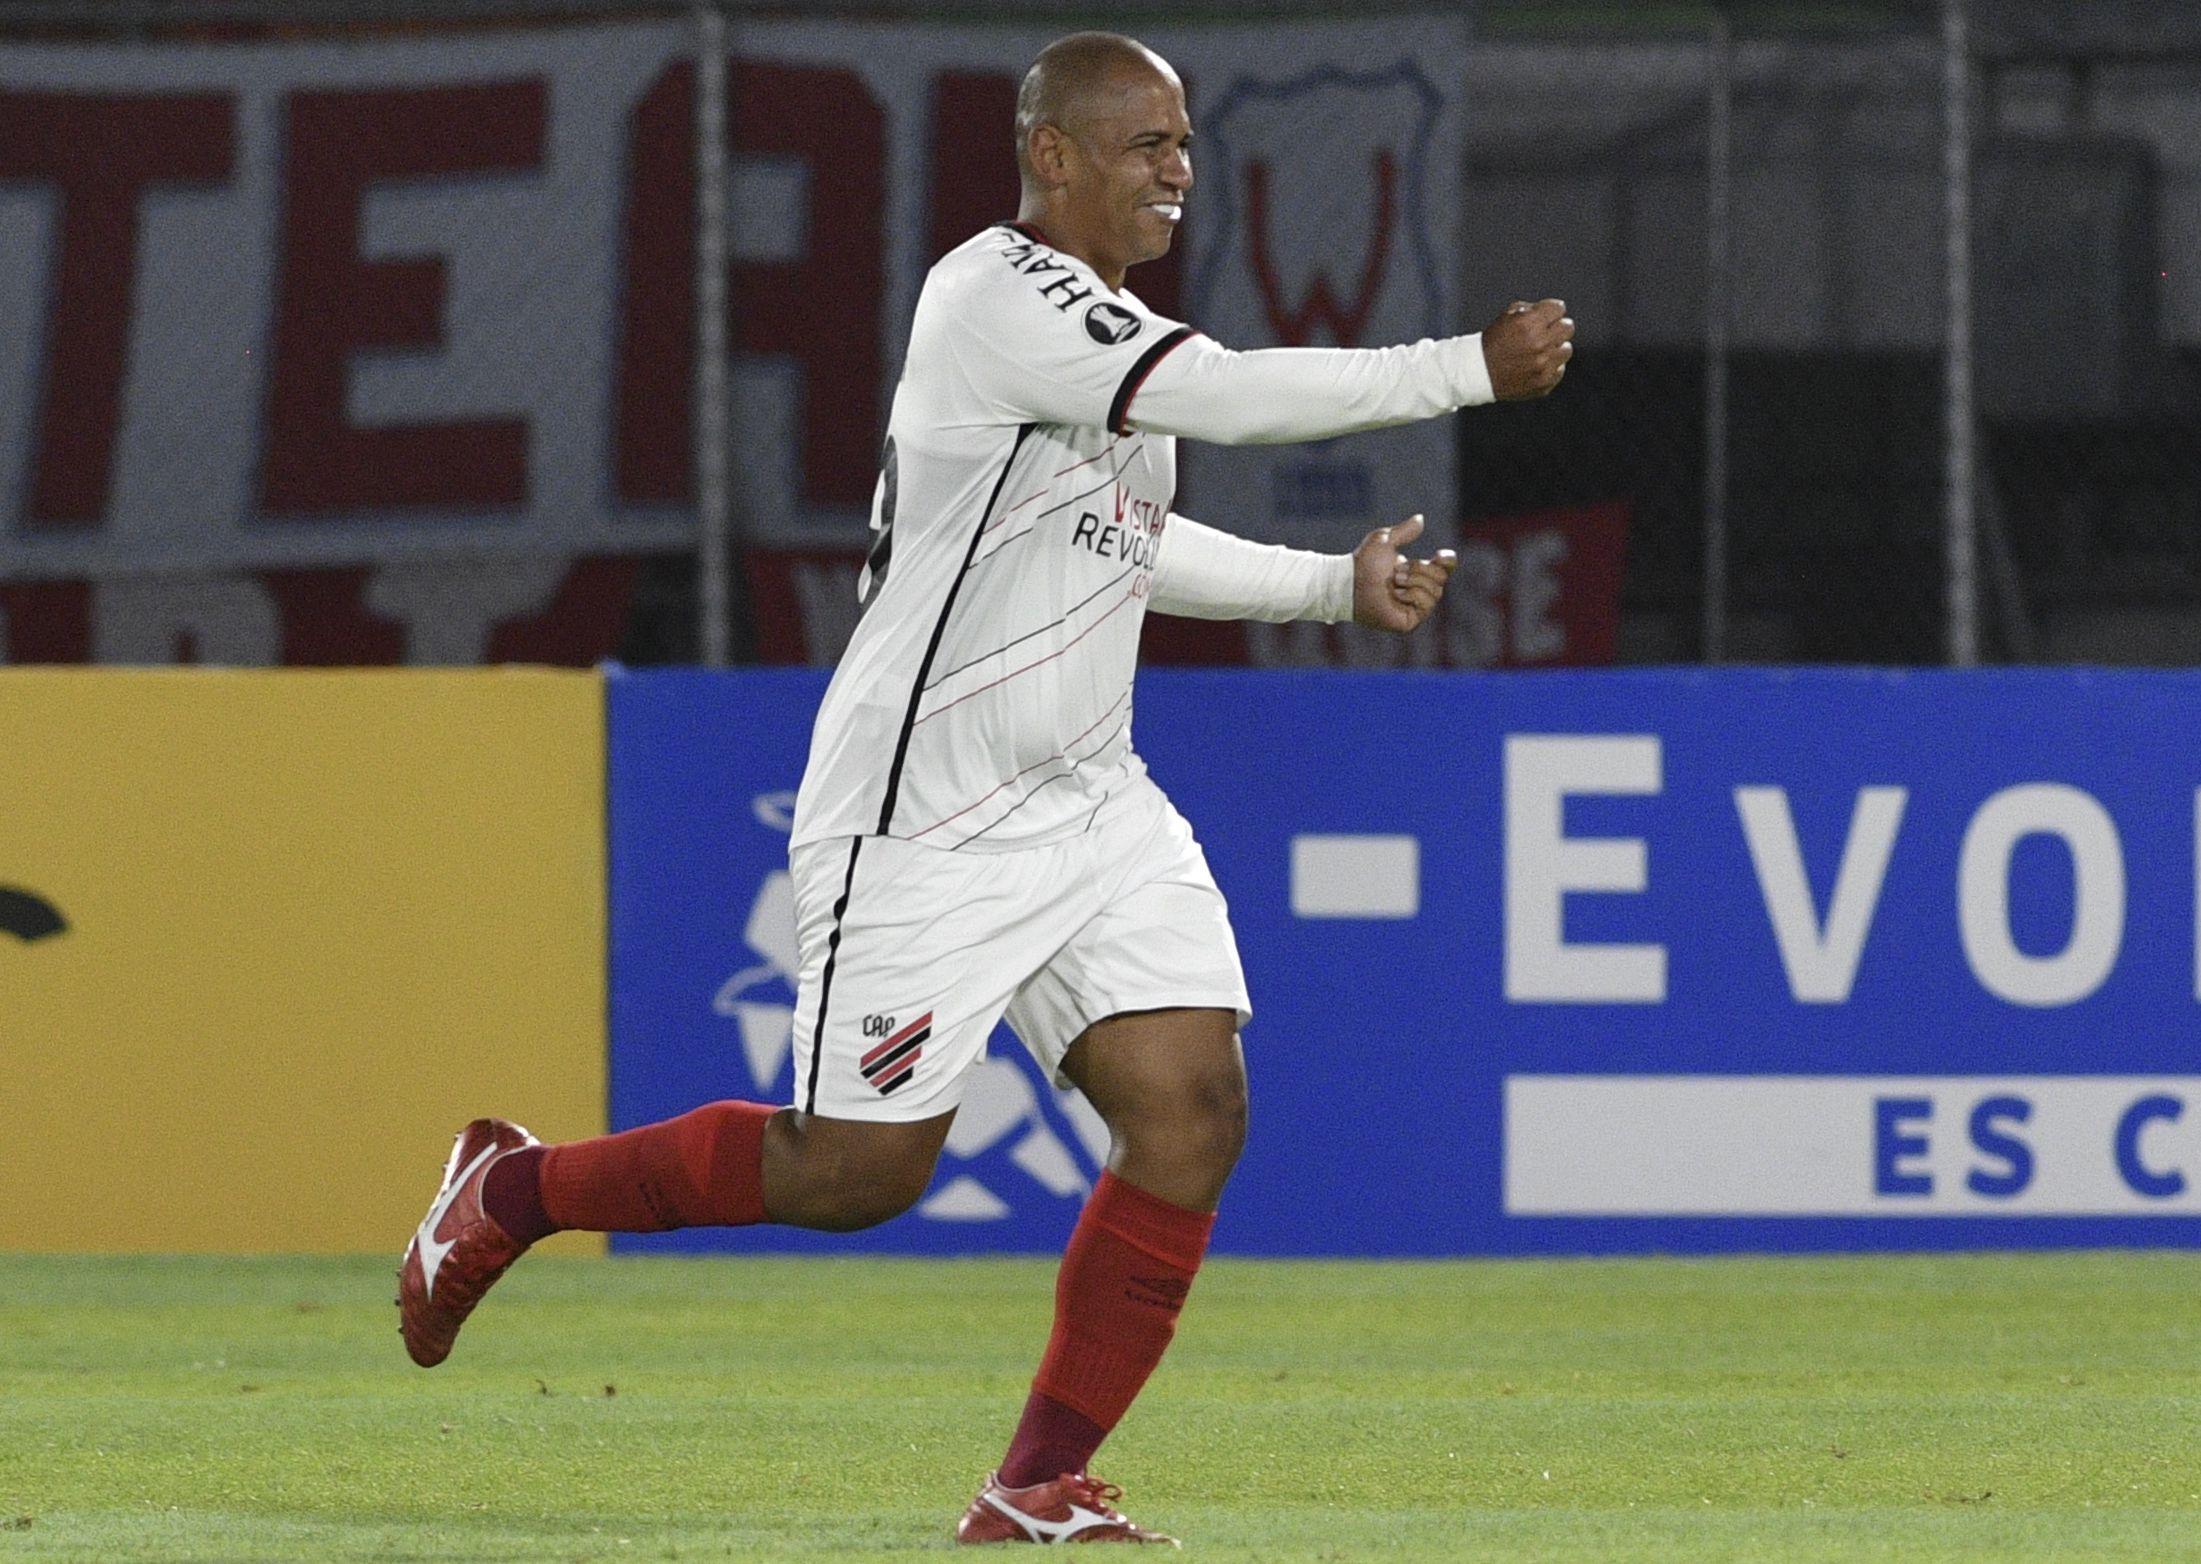 Festejo Paranaense 3 - 2 Jorge Wilstermann